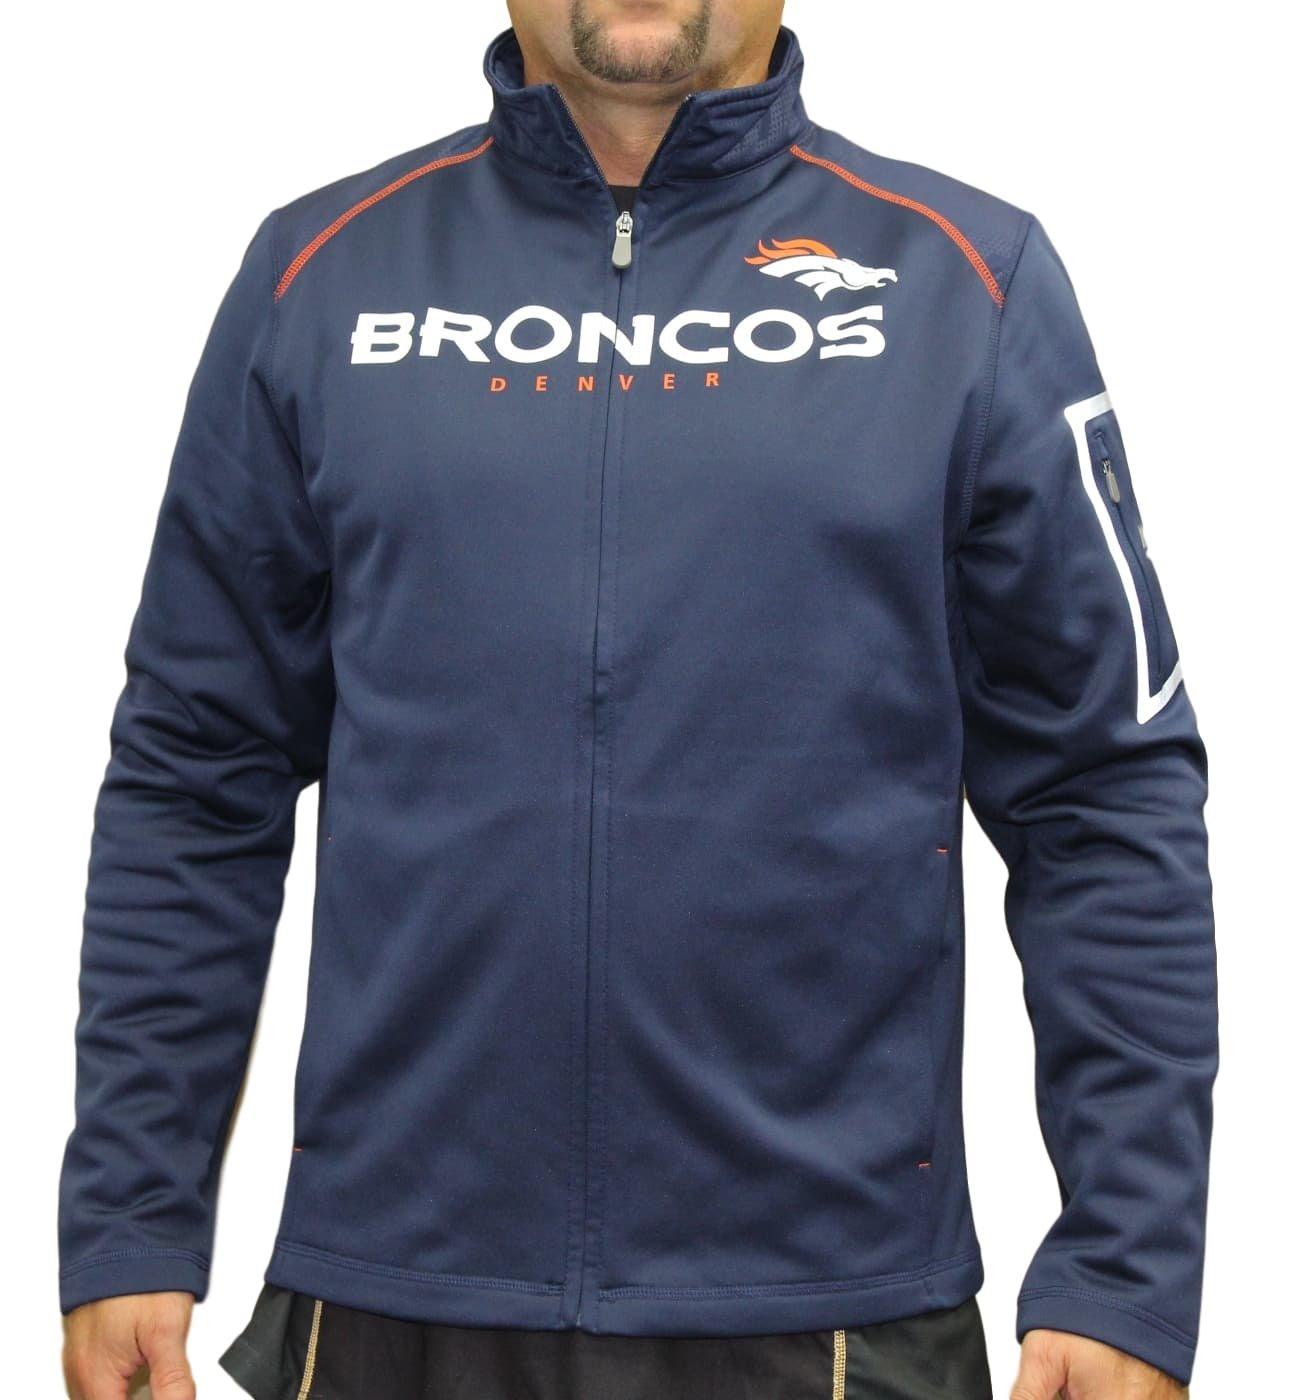 Denver Broncos Majestic NFL「チームワーク」メンズFull Zip Mock Neck Sweatshirt 3L  B072MVZBZK